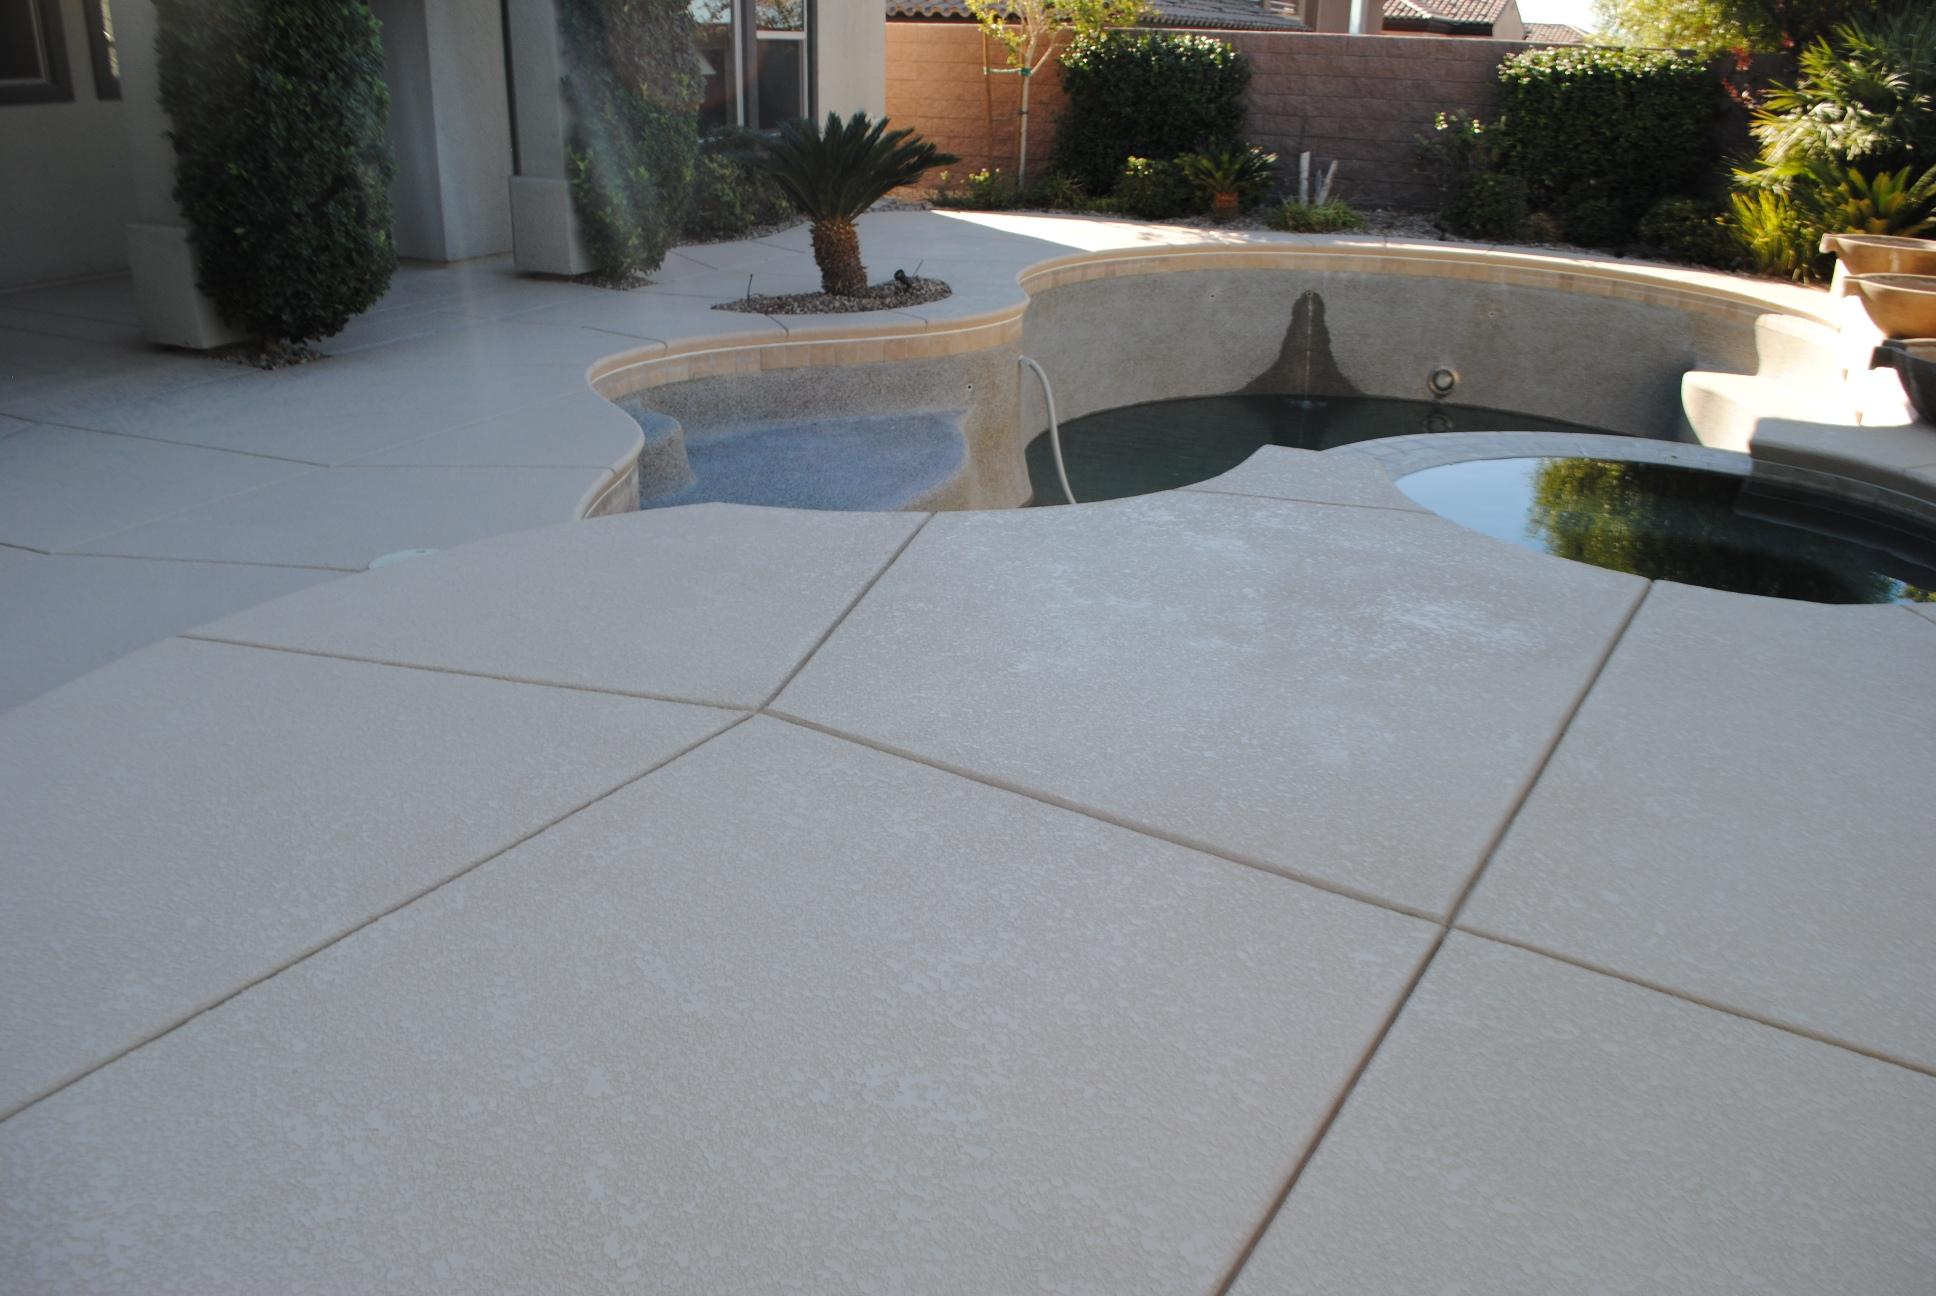 Pool Deck Remodel (after)